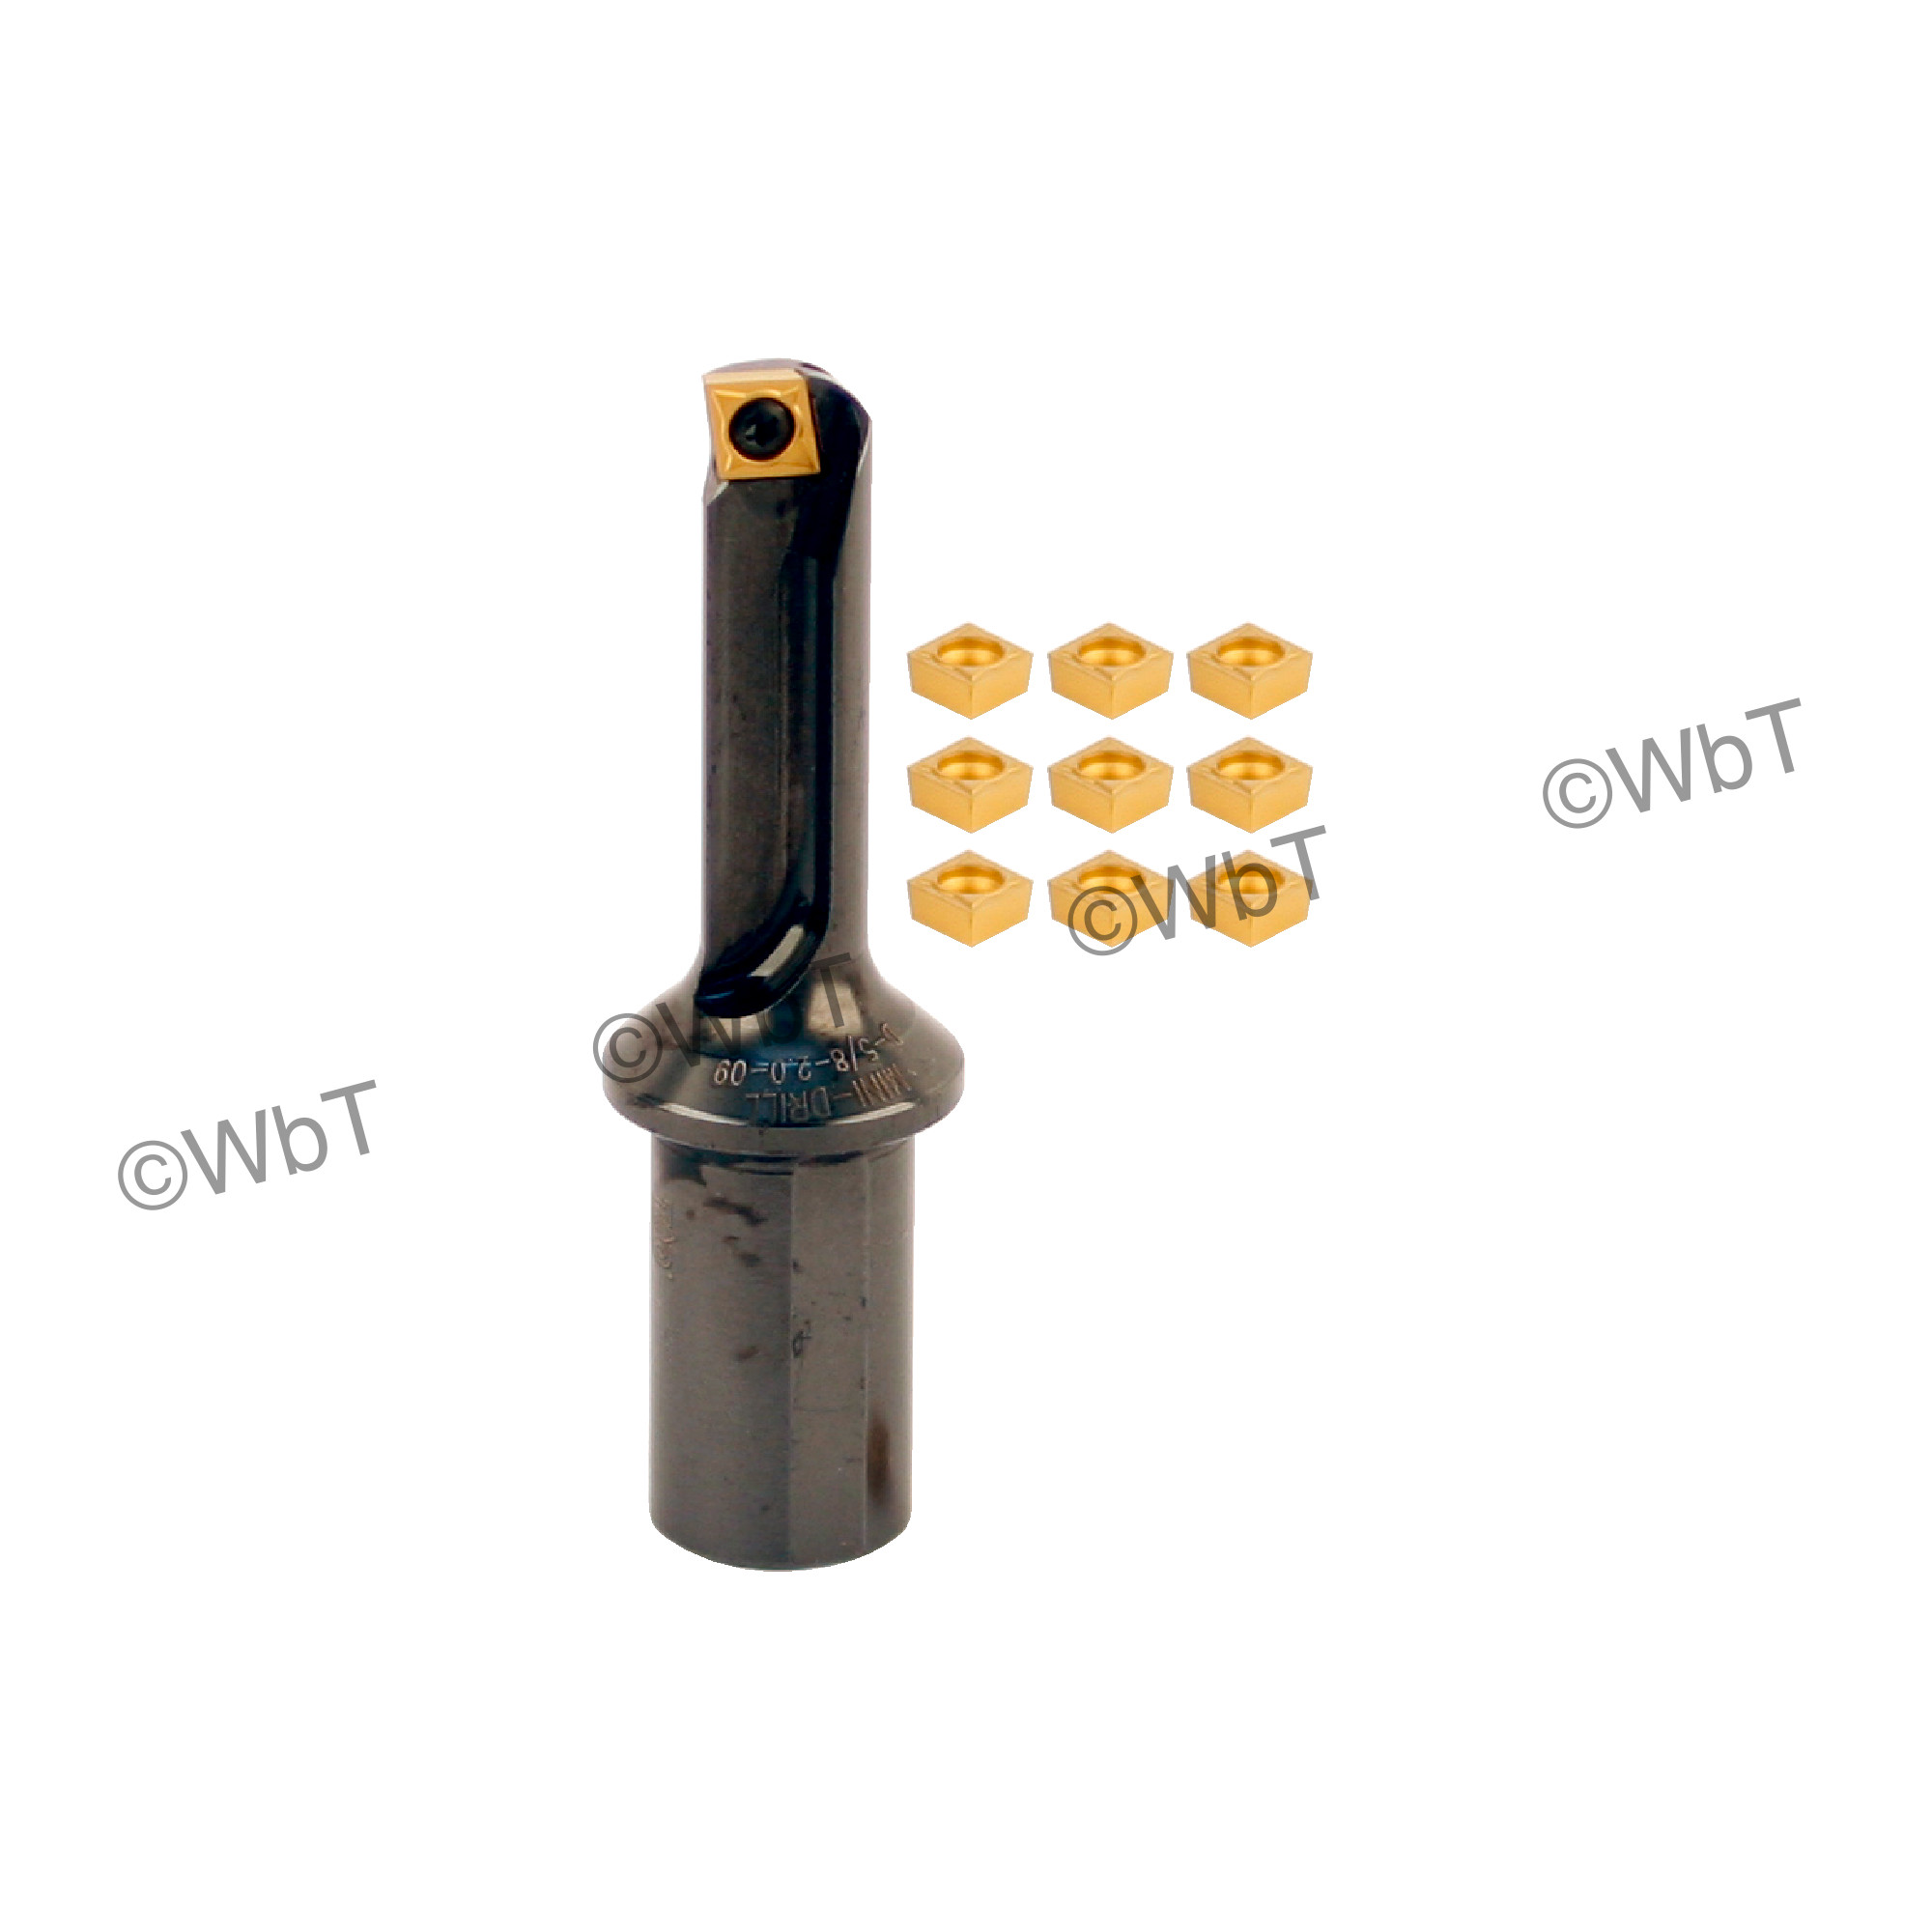 "T&O - D-5/8-2.0-09 SET - Multi Tool Set / (1) 5/8"" MULTI-TOOL (5/8""ø) & (10) CCMT3(2.5)1 Coated Inserts / 2.000"""